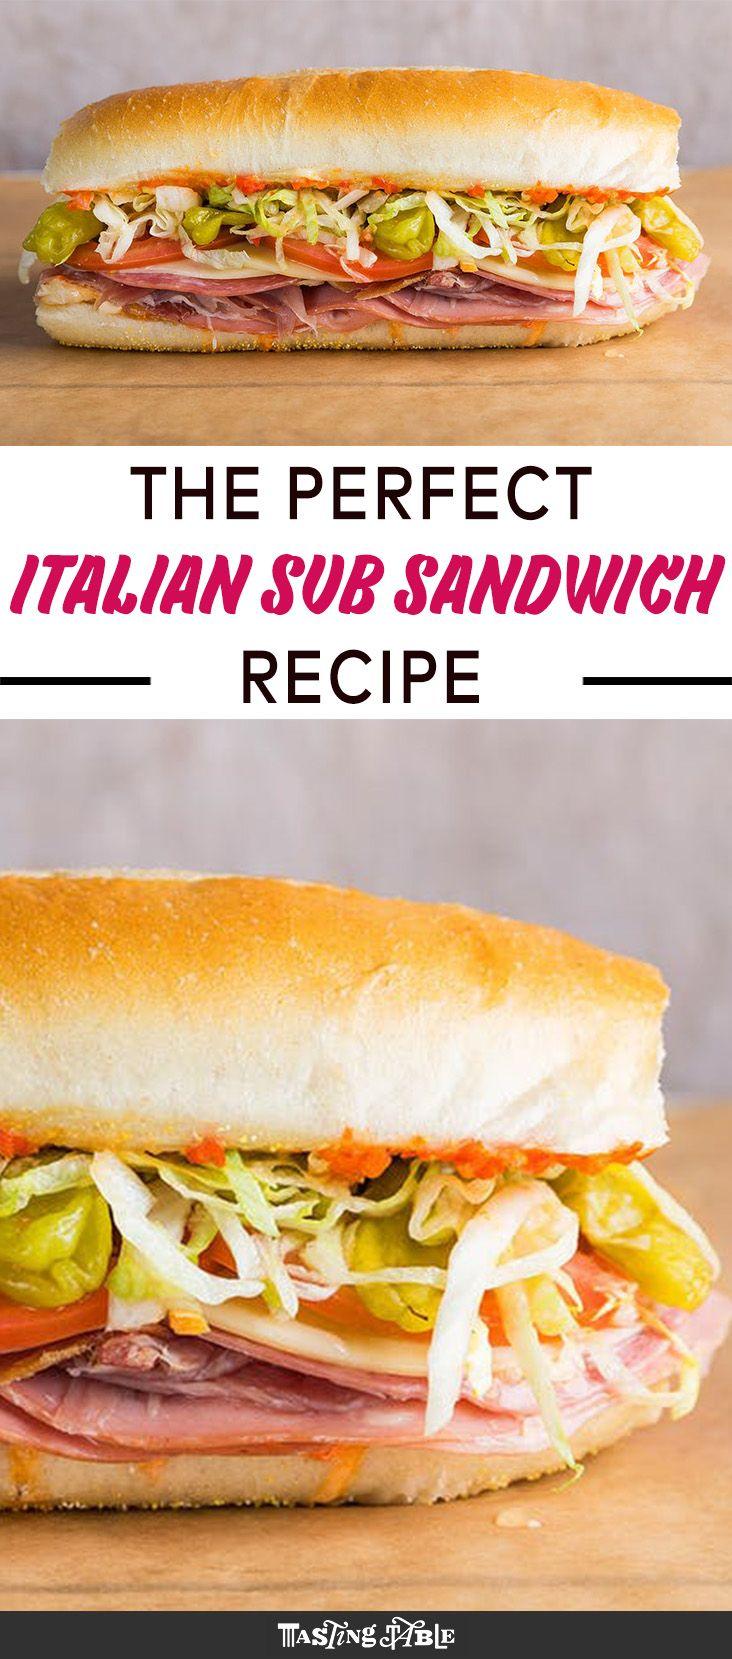 This sandwich is a true hero